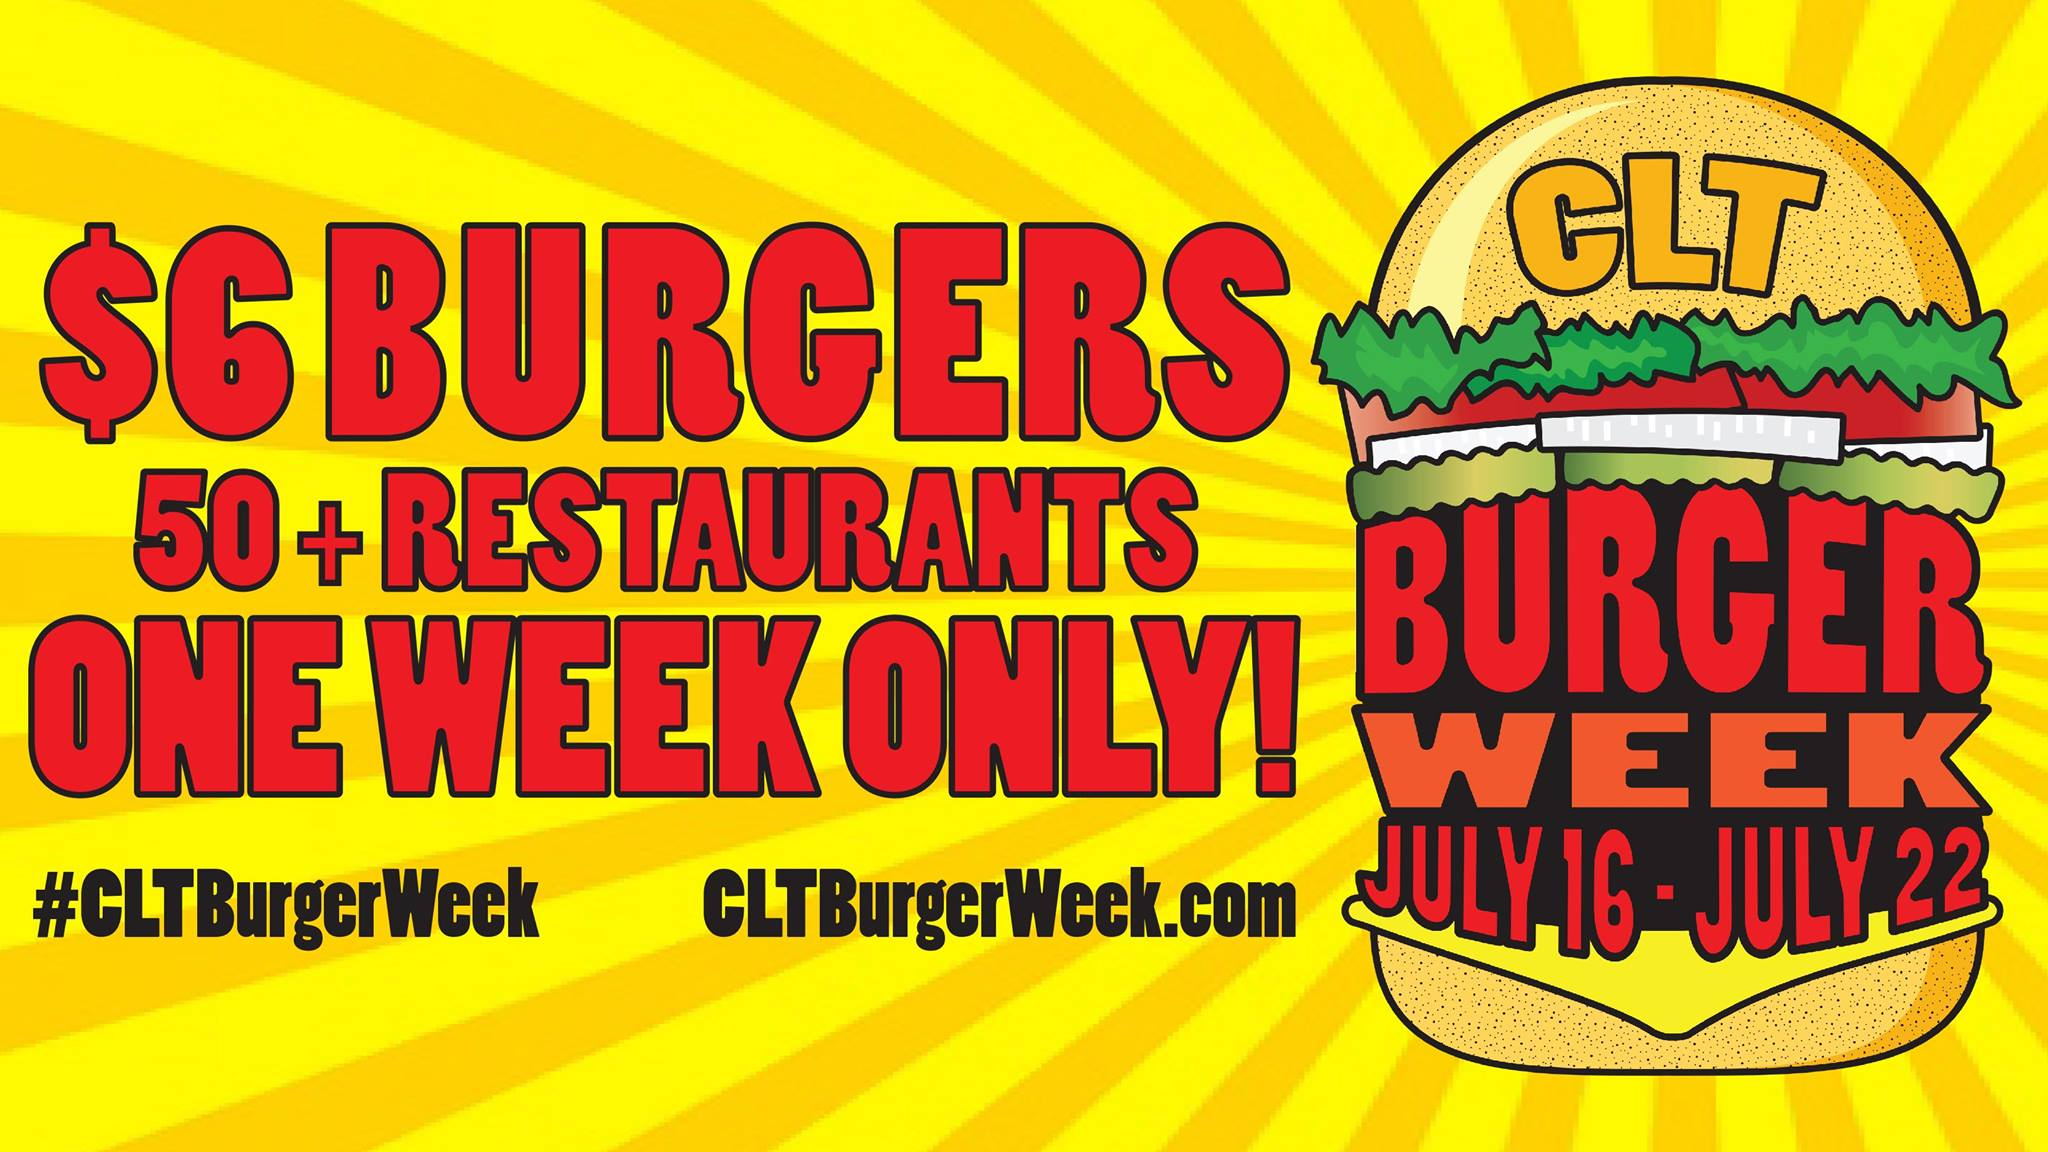 clt-burger-week.jpg